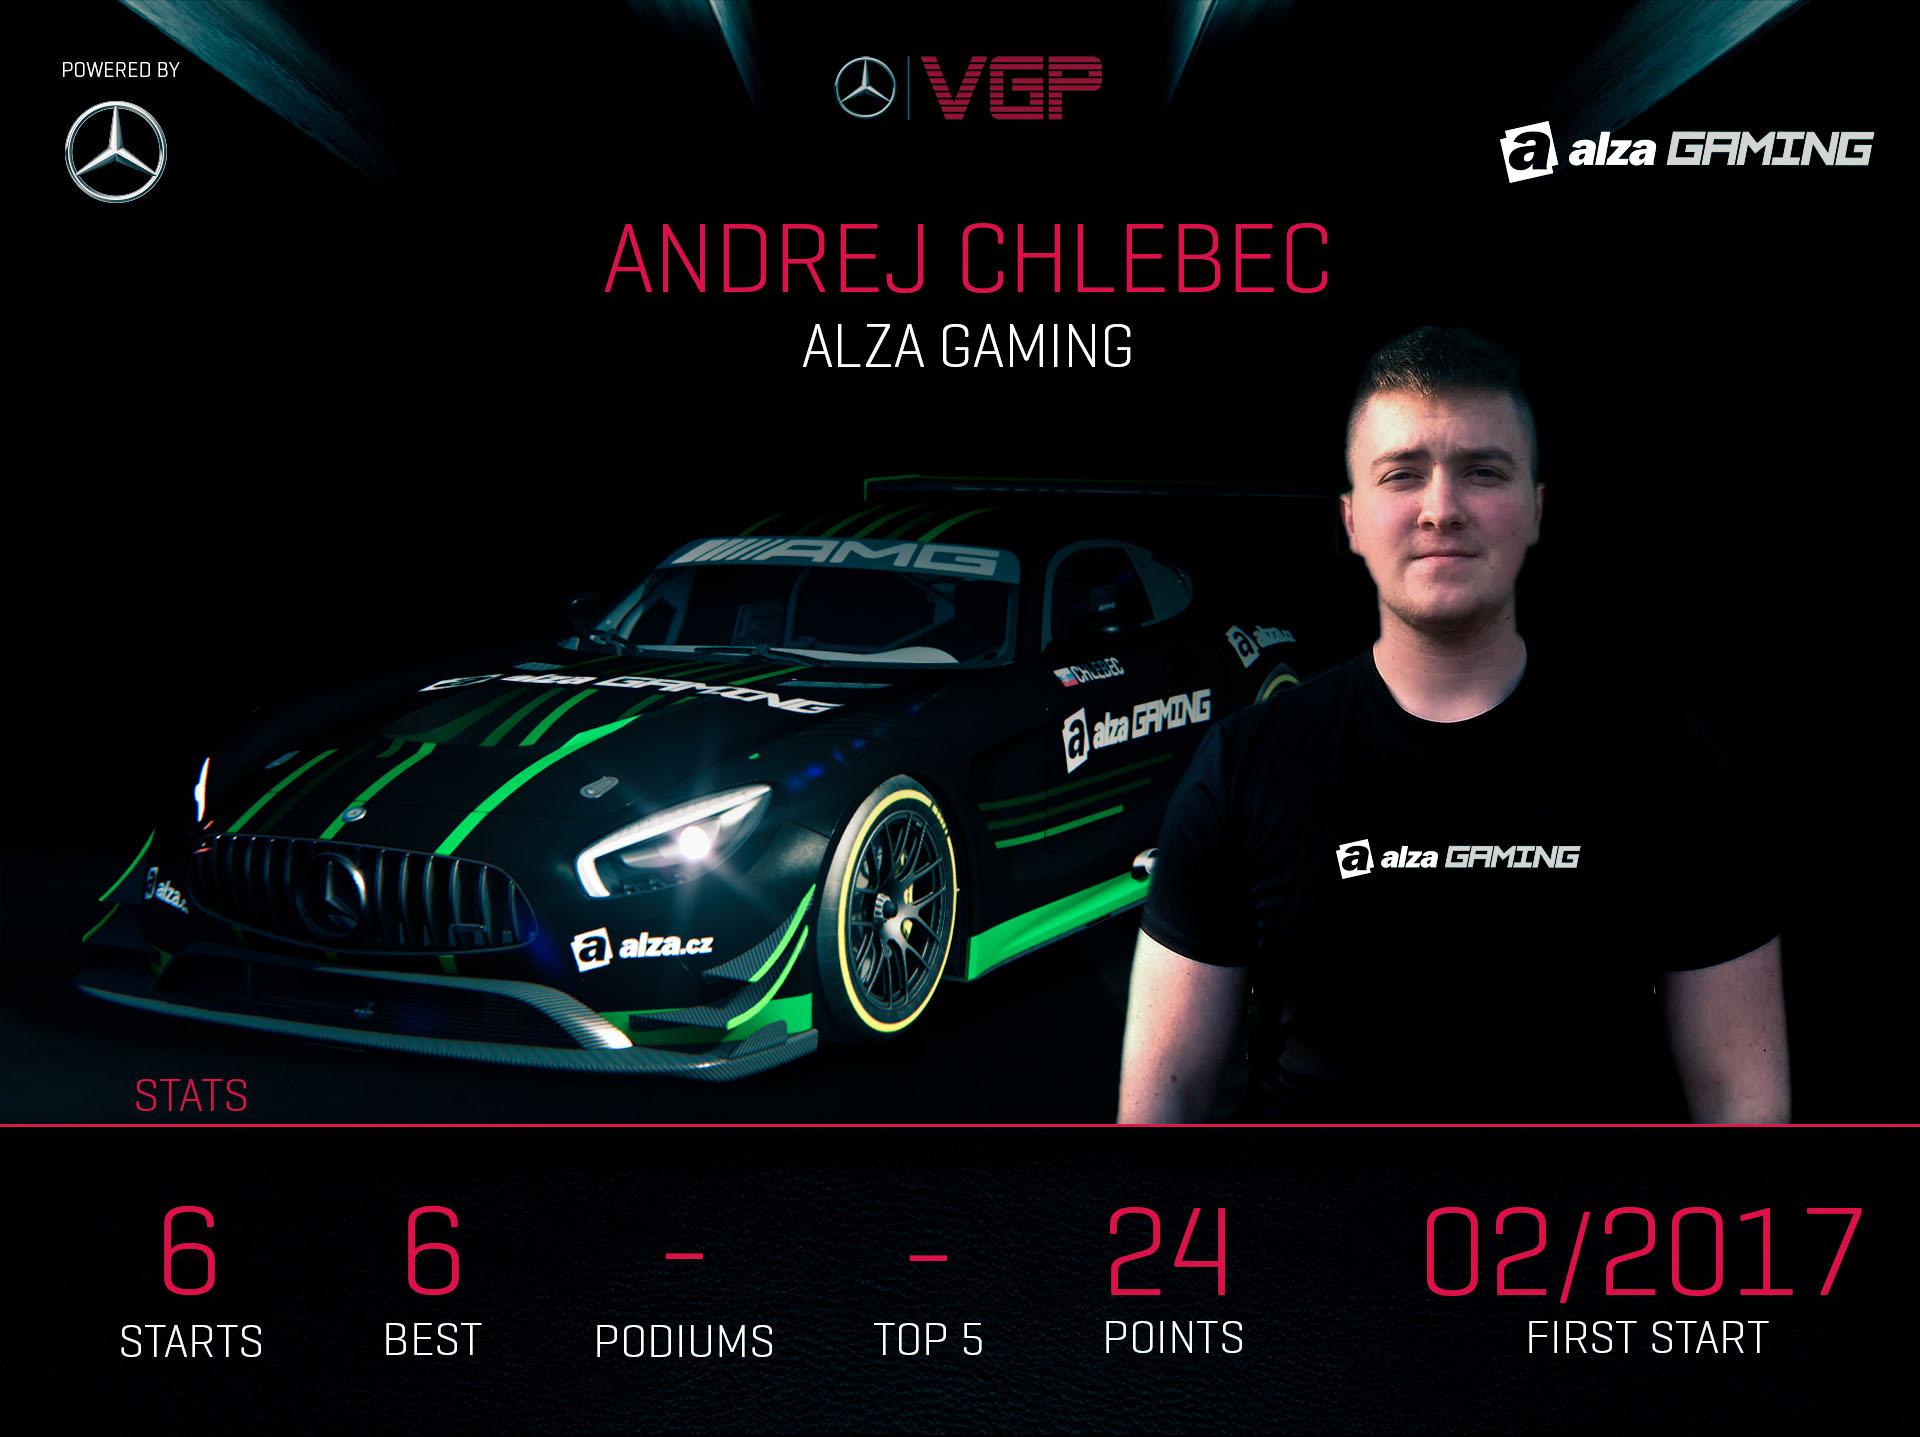 Chlebec Alza Gaming